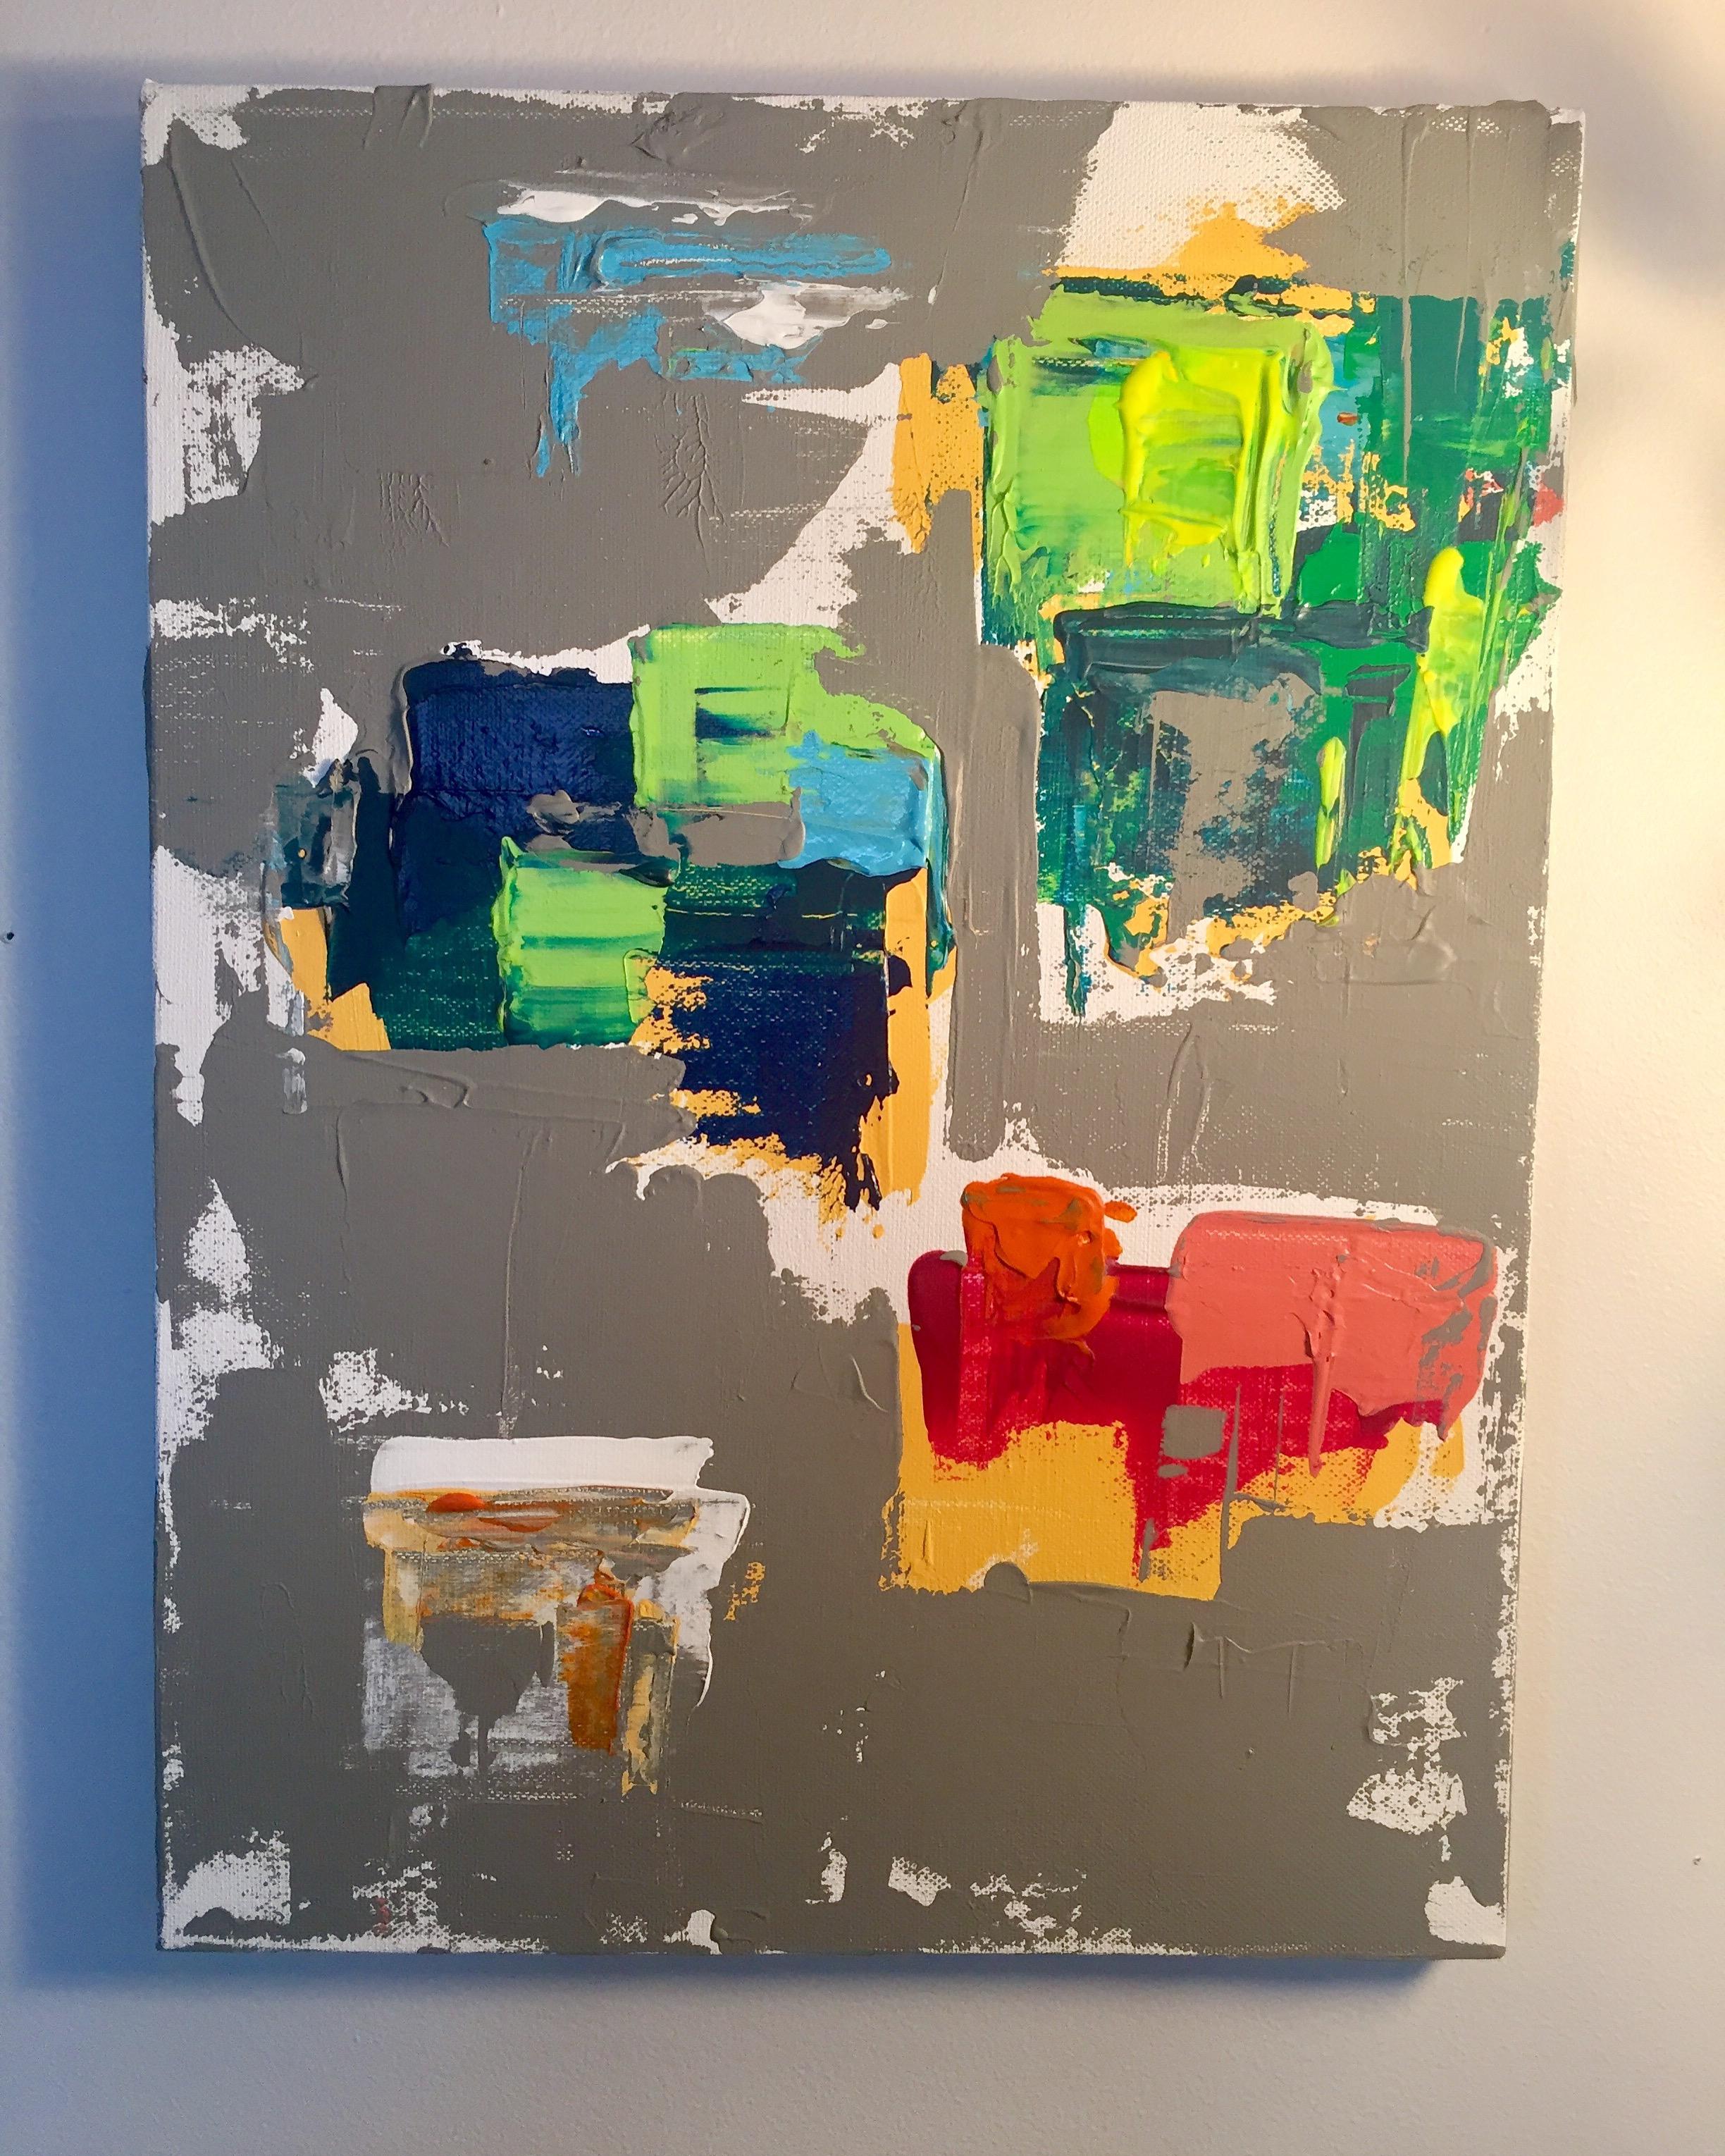 "Maps-Acrylic | Canvas | Palette Knife 12 X 16"" Planes Series 2017"